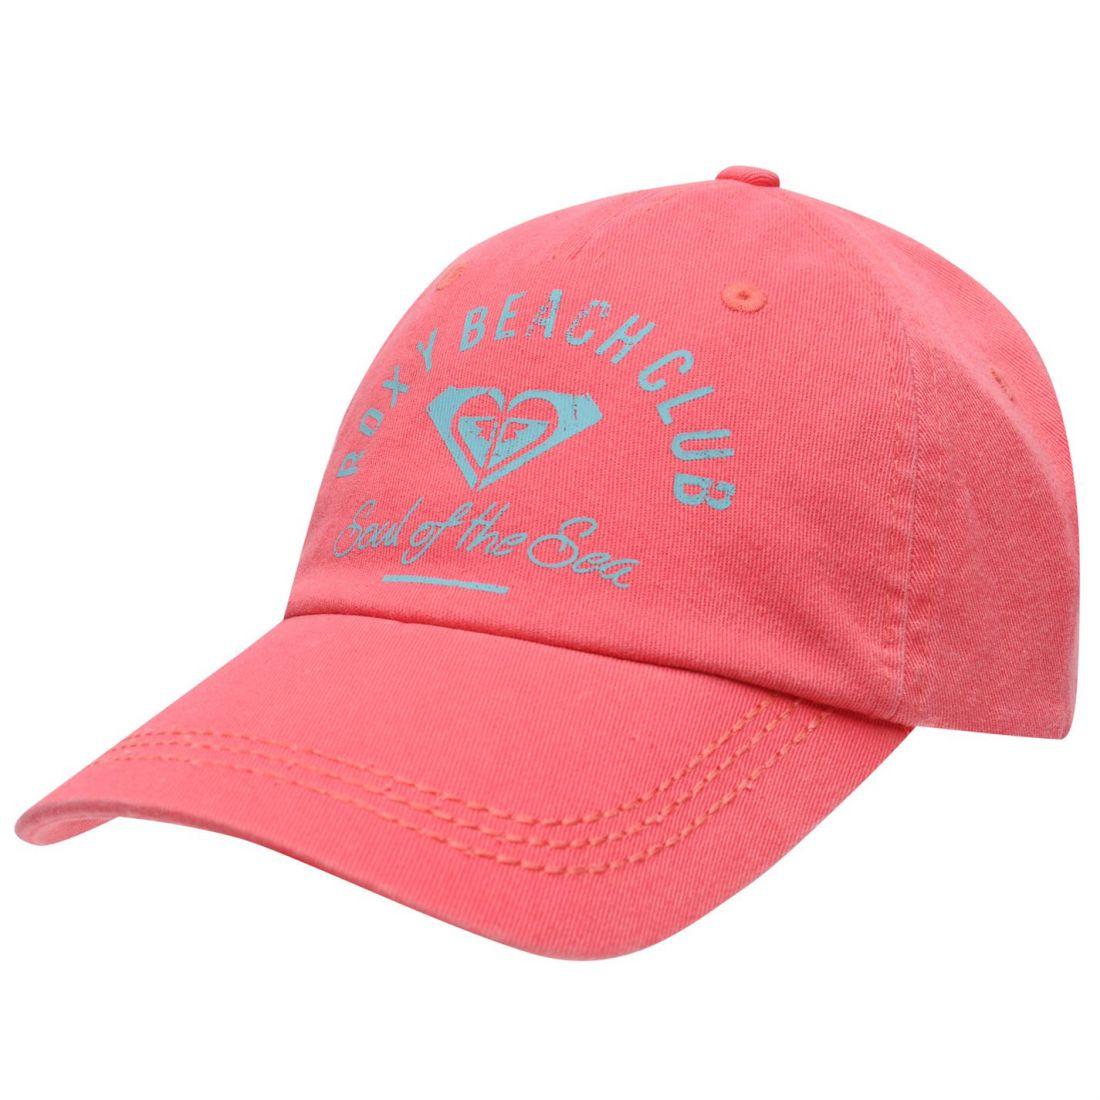 Roxy Womens Cappy Cap Baseball  1a089cda961b